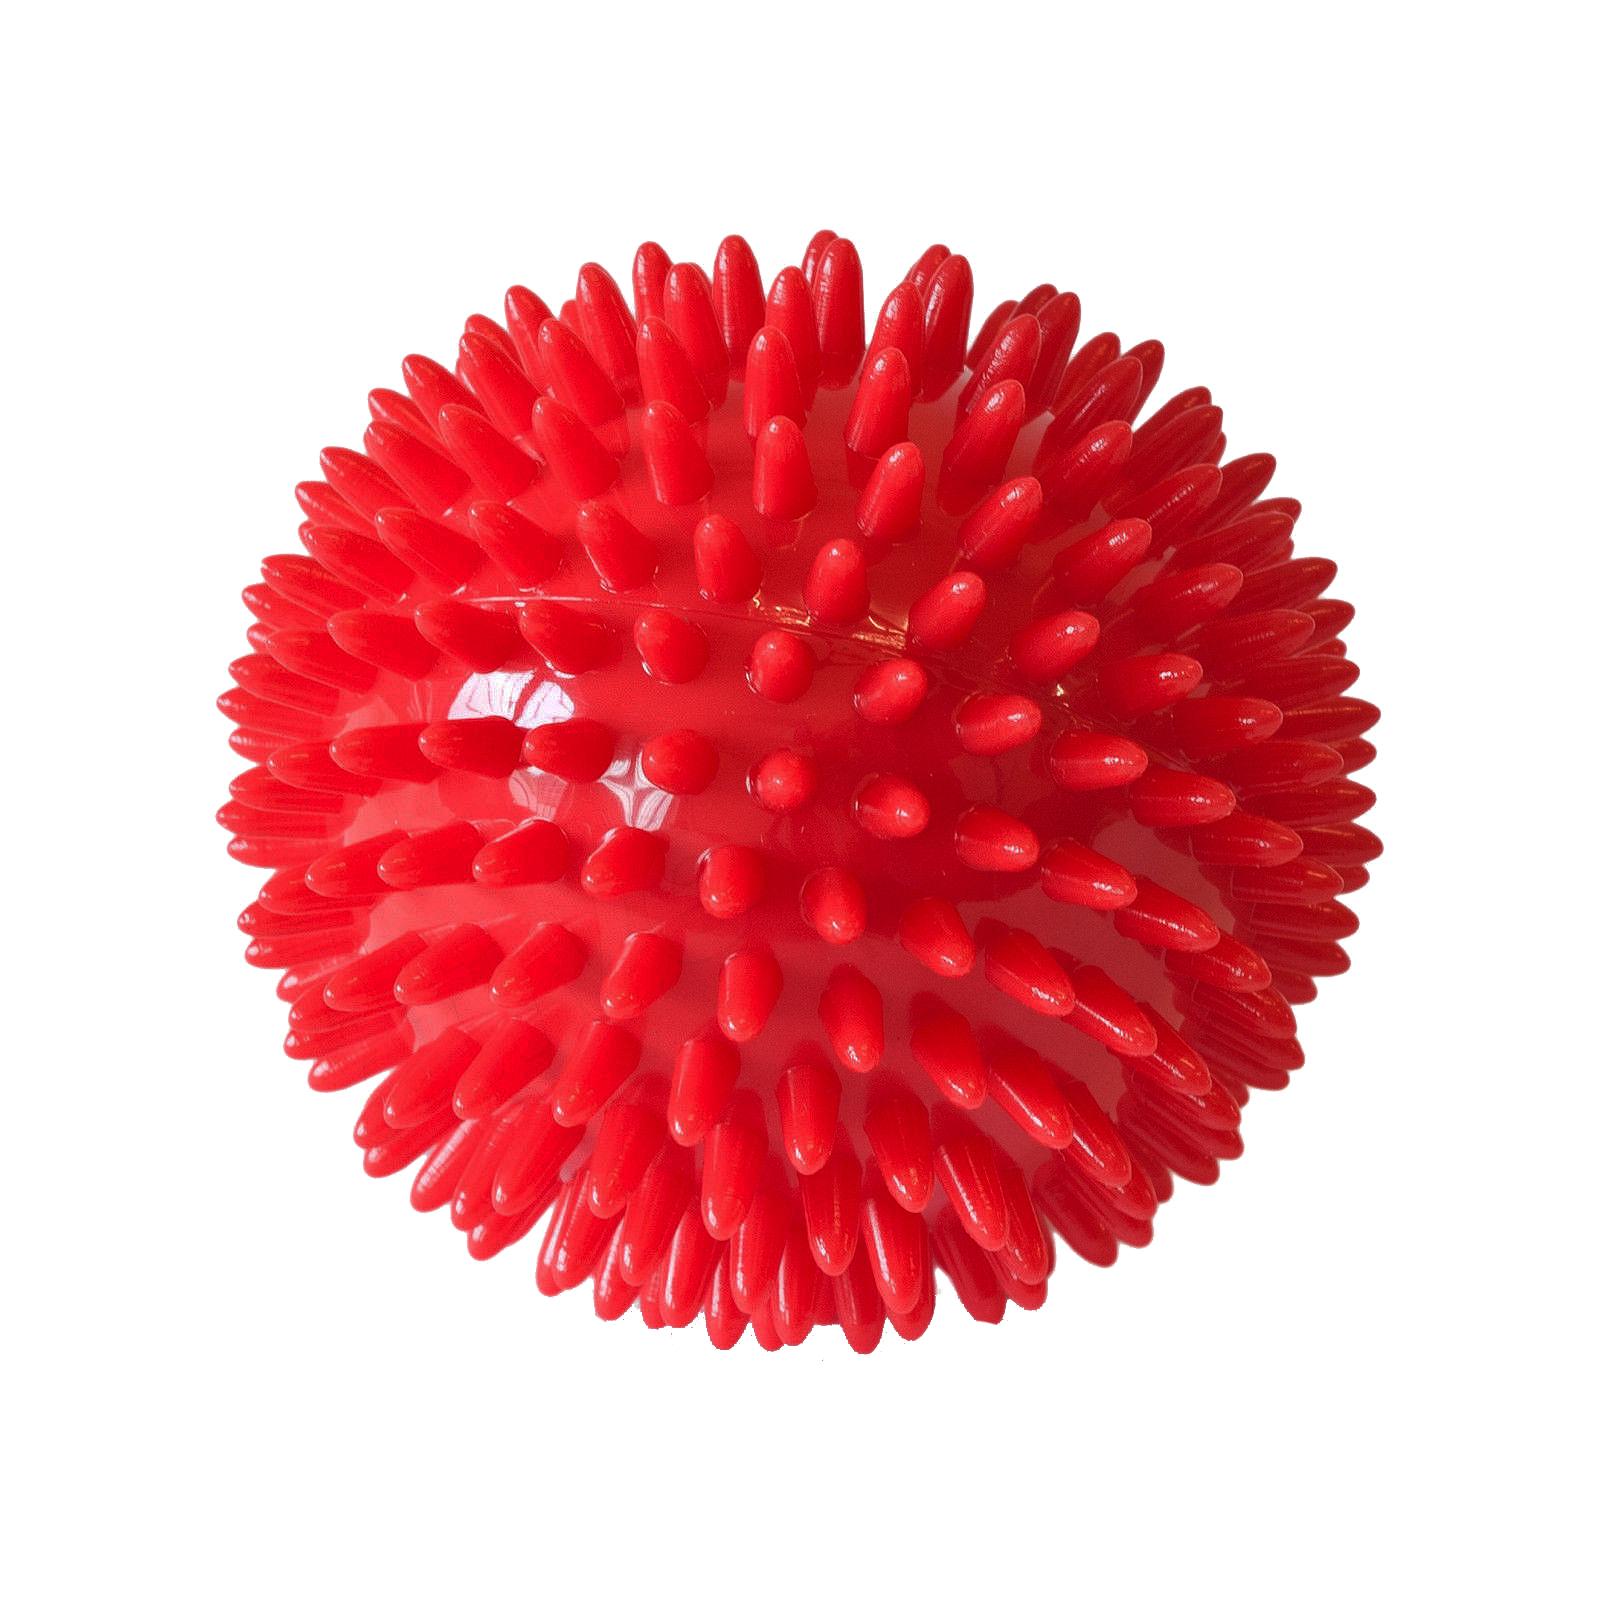 Yoga Studio Spikey Massage Gym Balls Spiky Yoga Stress